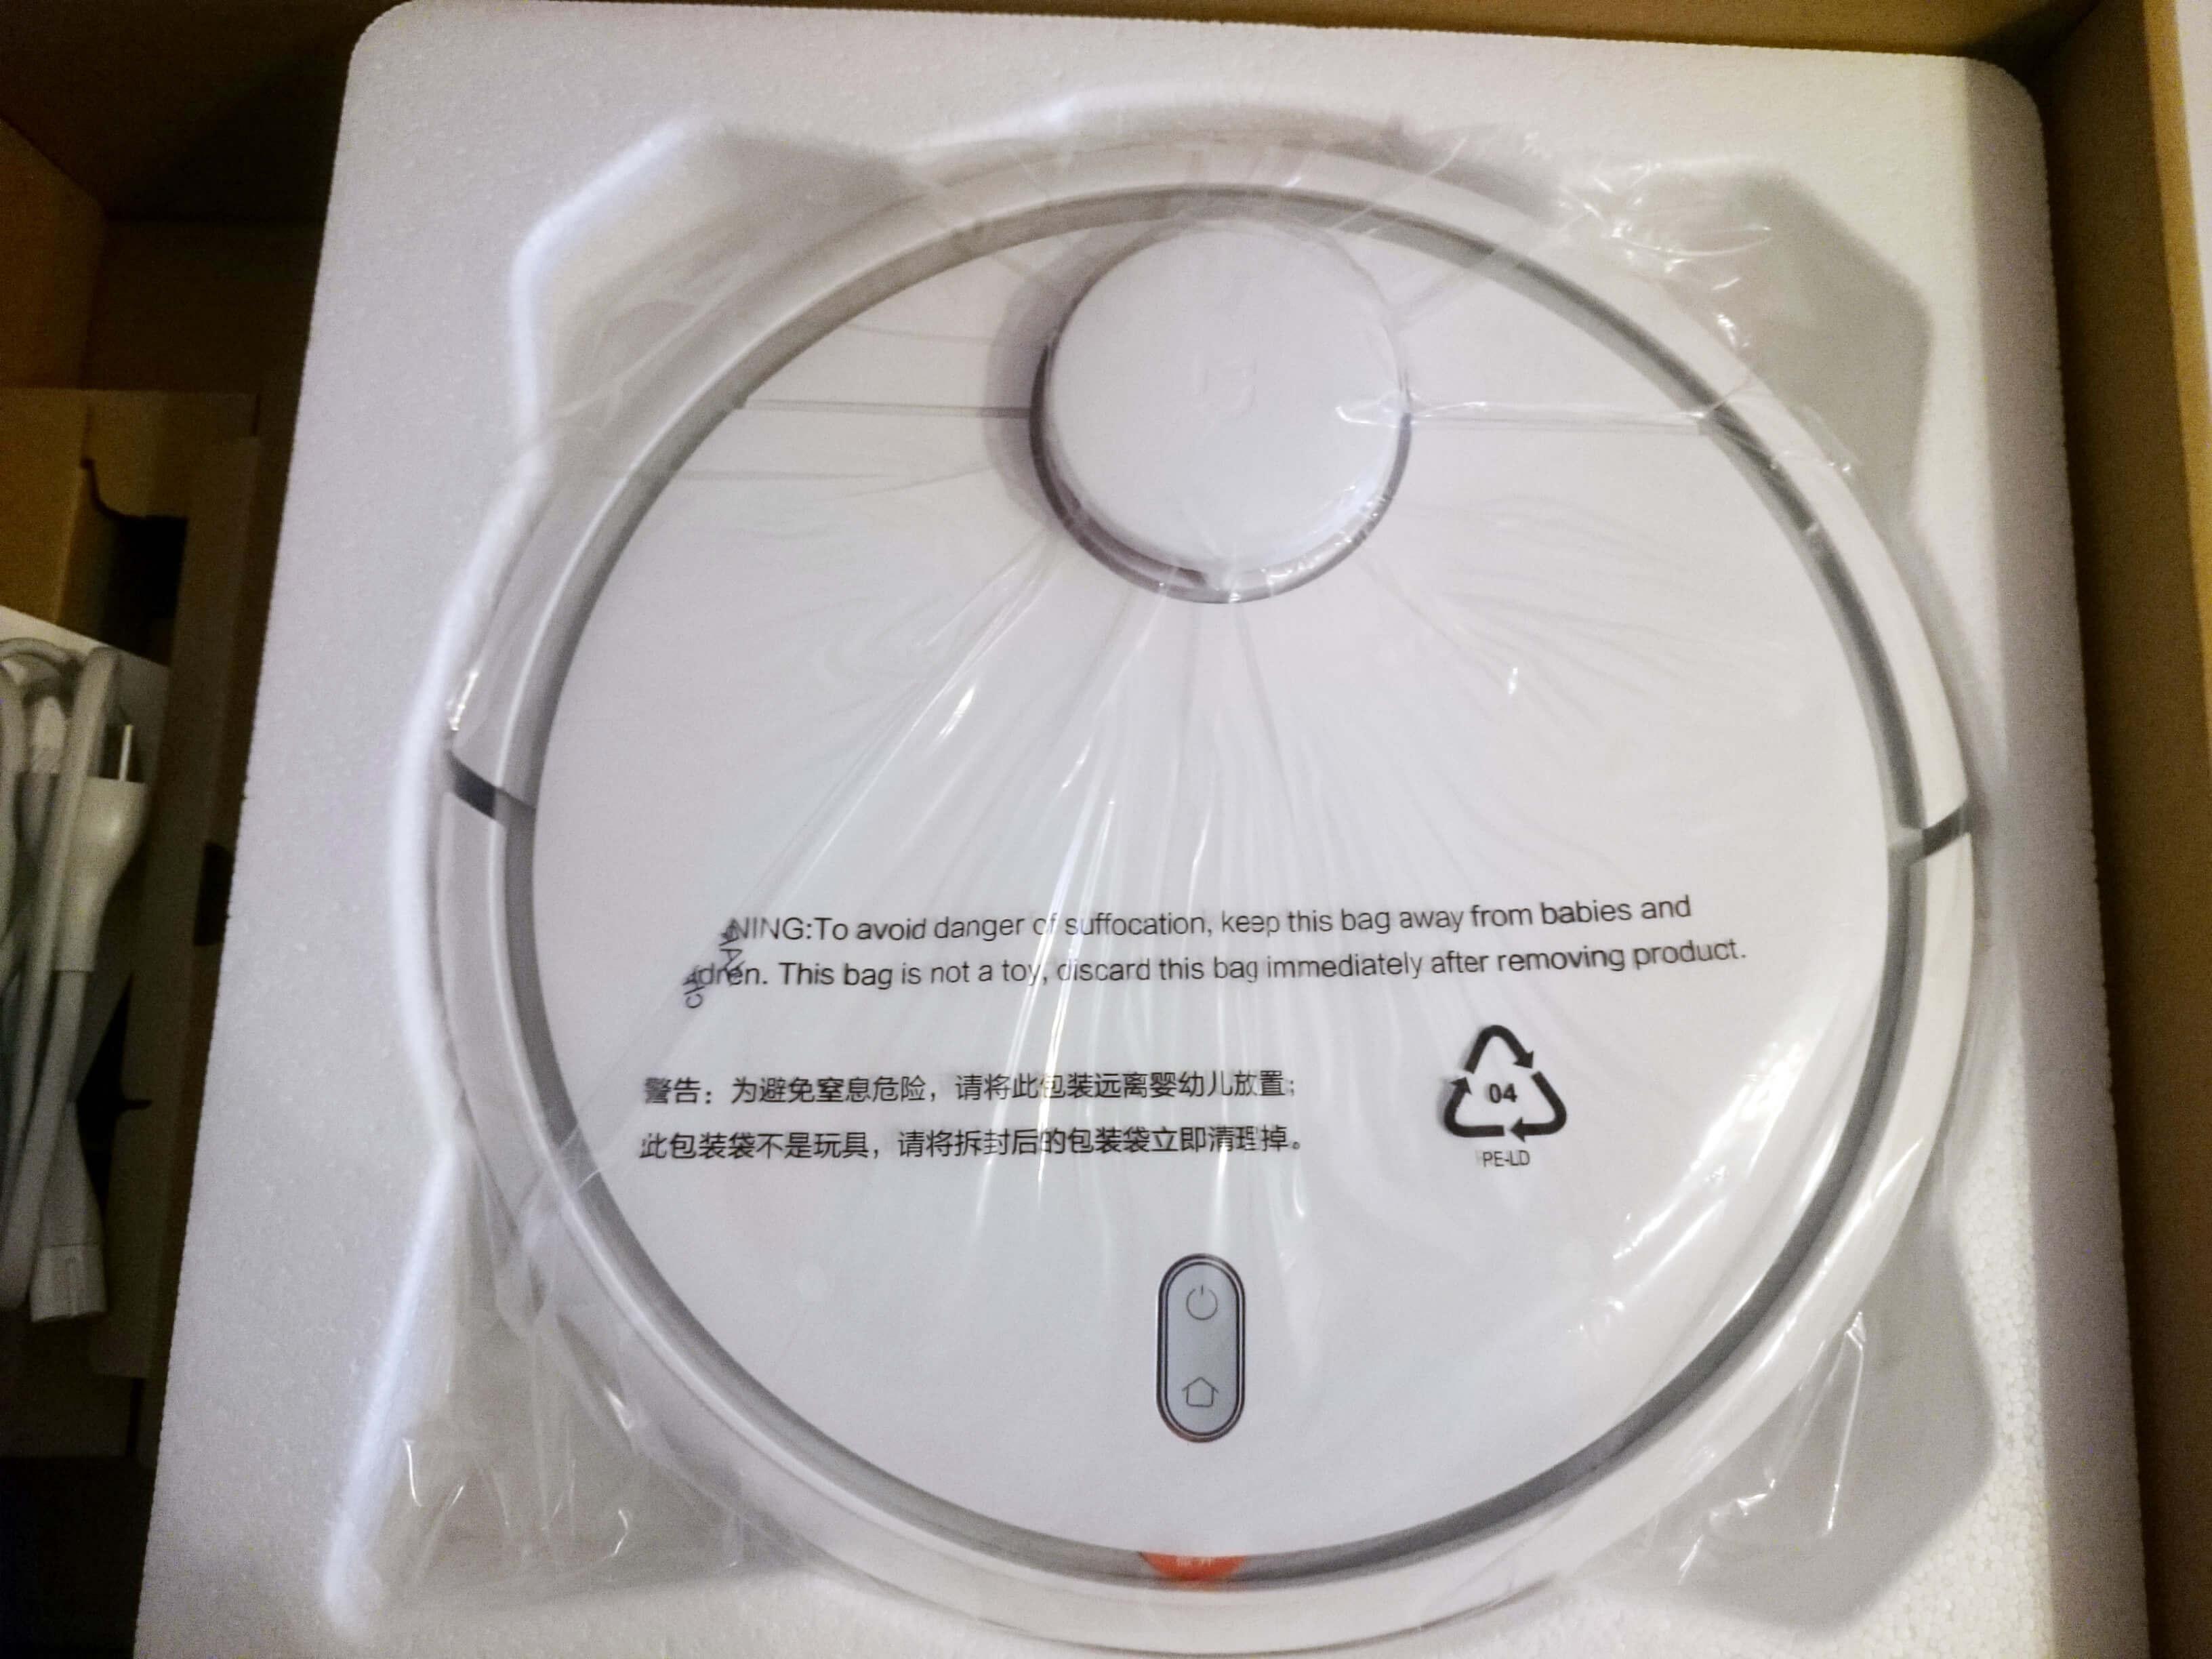 Fußboden Wohnung Xiaomi ~ Test xiaomi mi robot vacuum staubsauger roboter